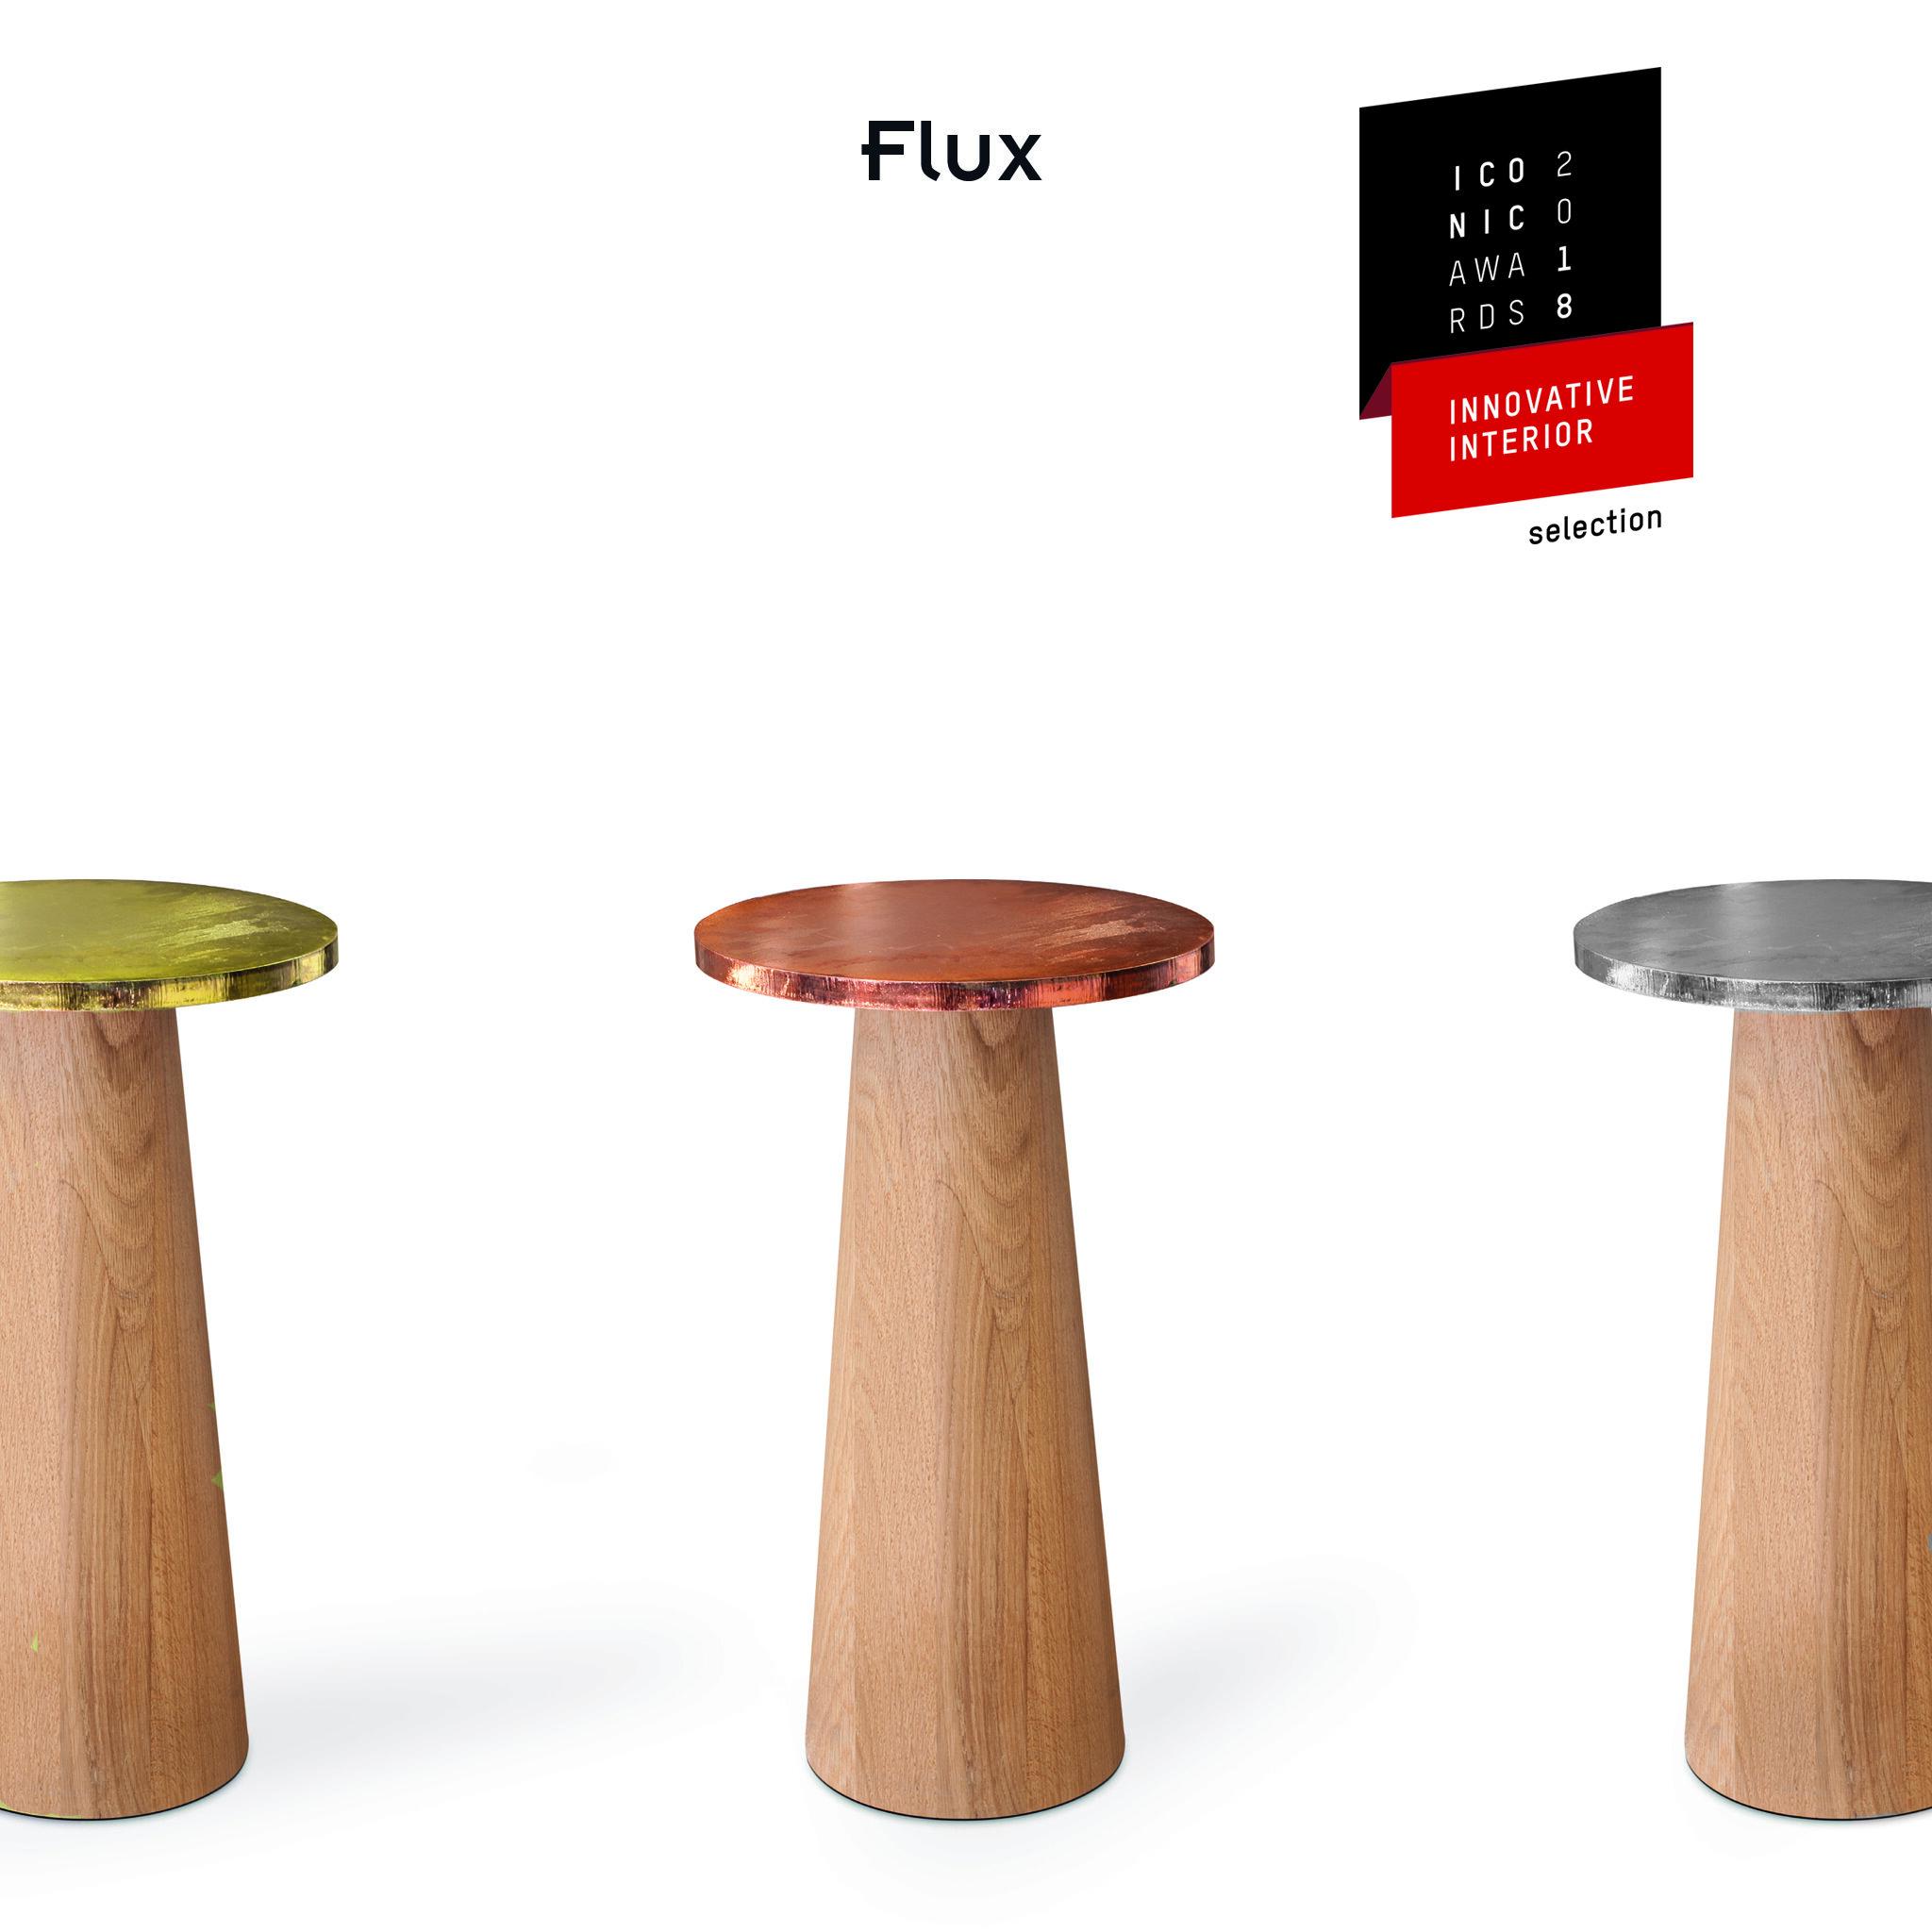 FLUX_Award_Fb-dsz-web.jpg